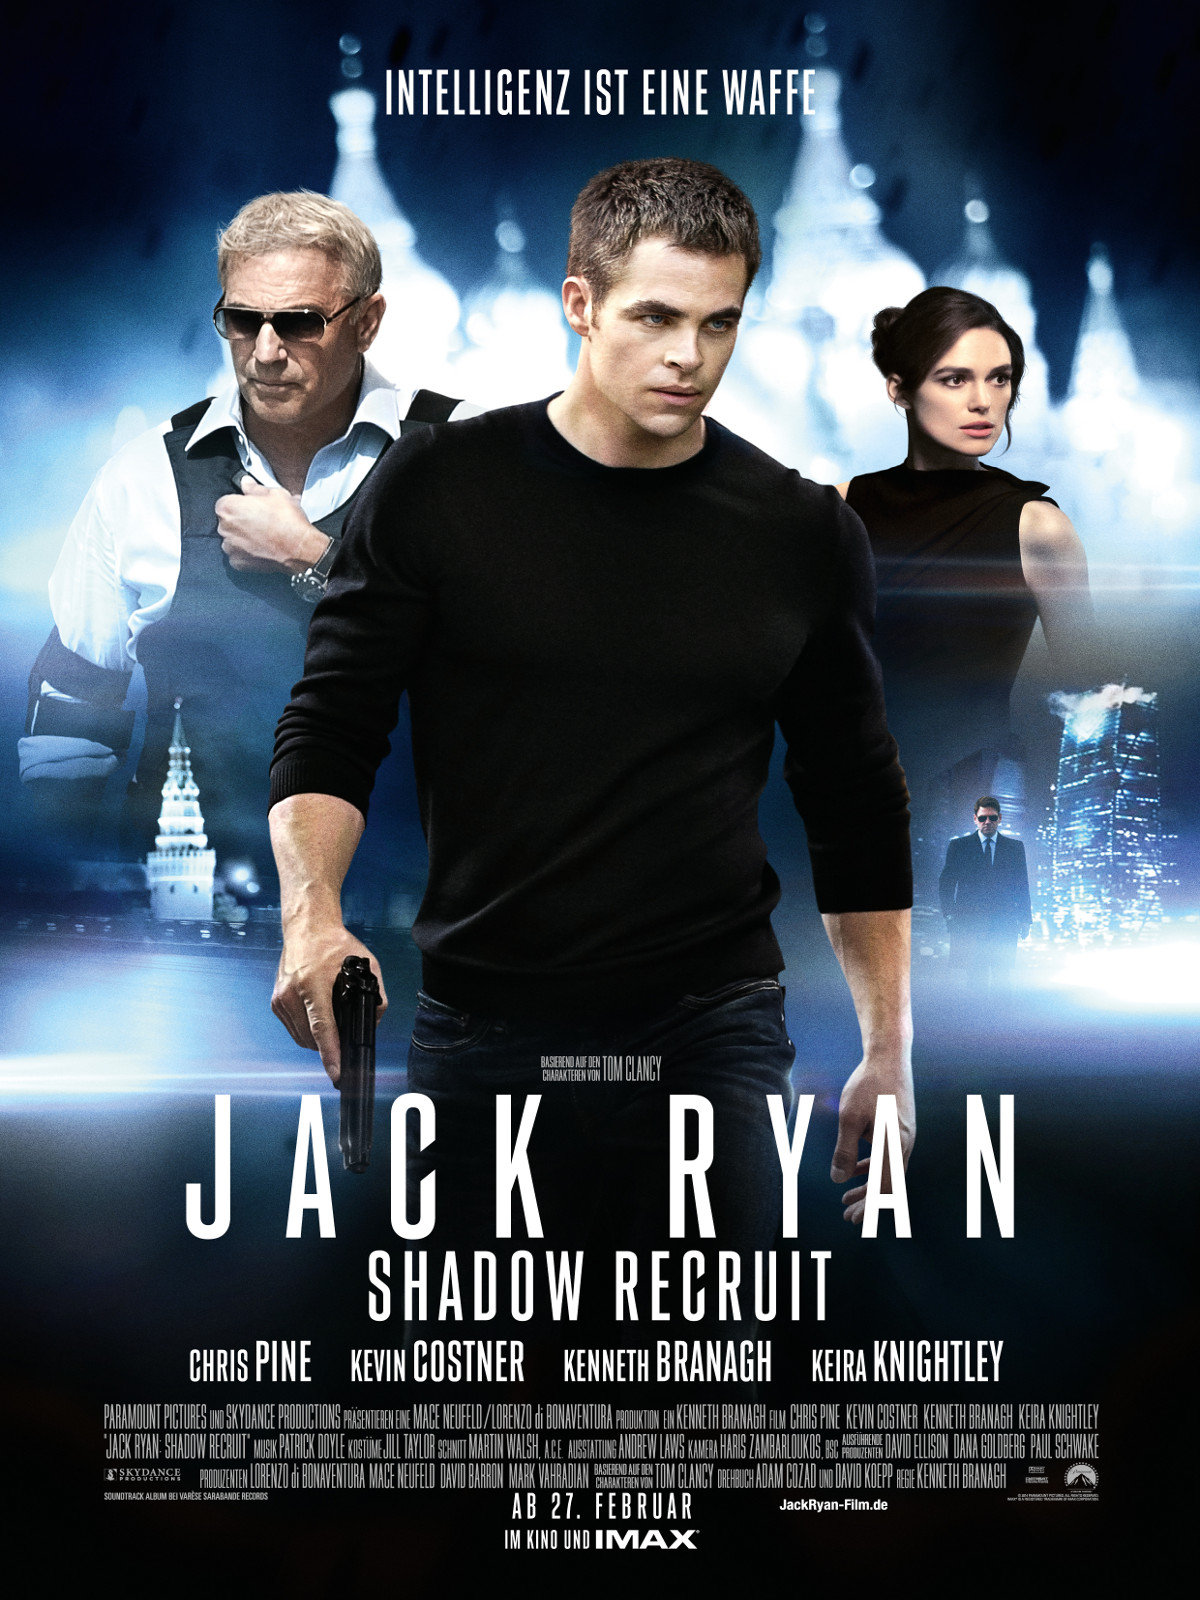 Jack Ryan: Shadow Recruit Soundtrack